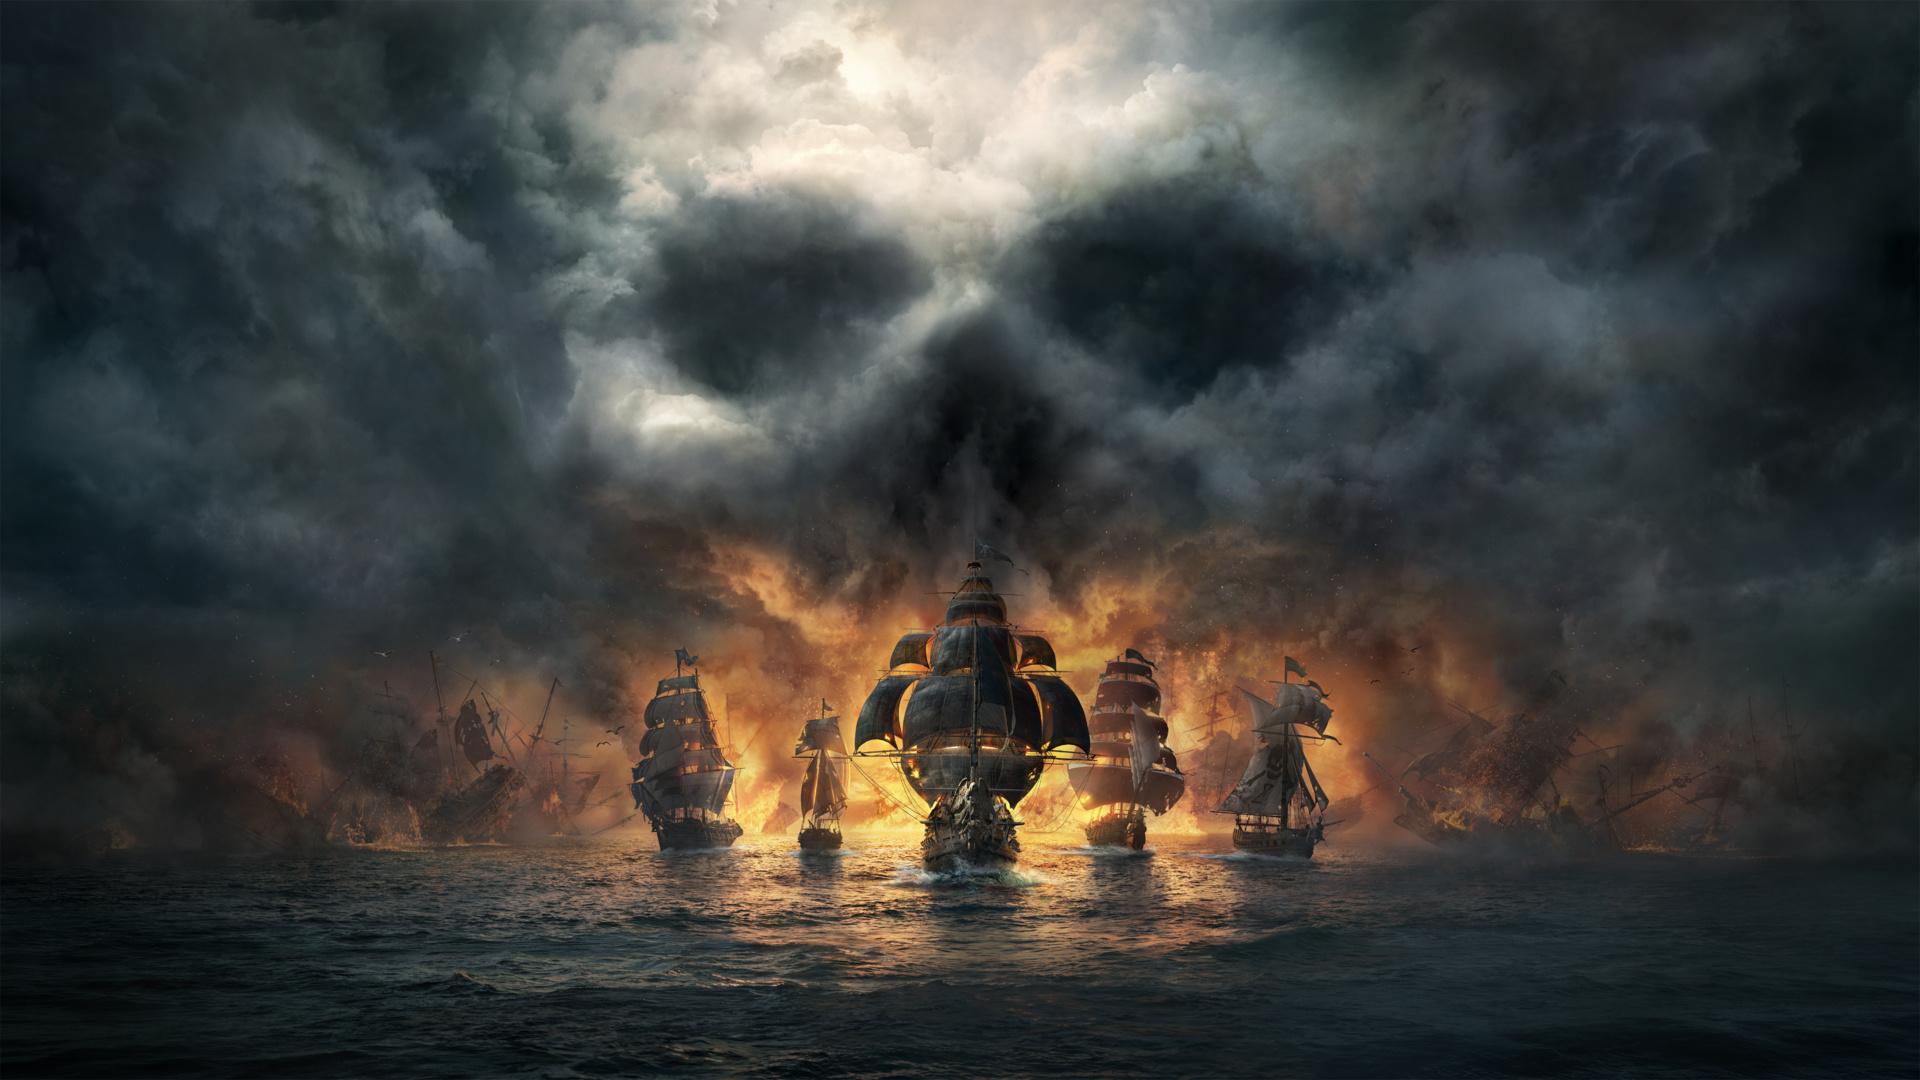 Pirate armada Wallpaper from Skull Bones gamepressurecom 1920x1080